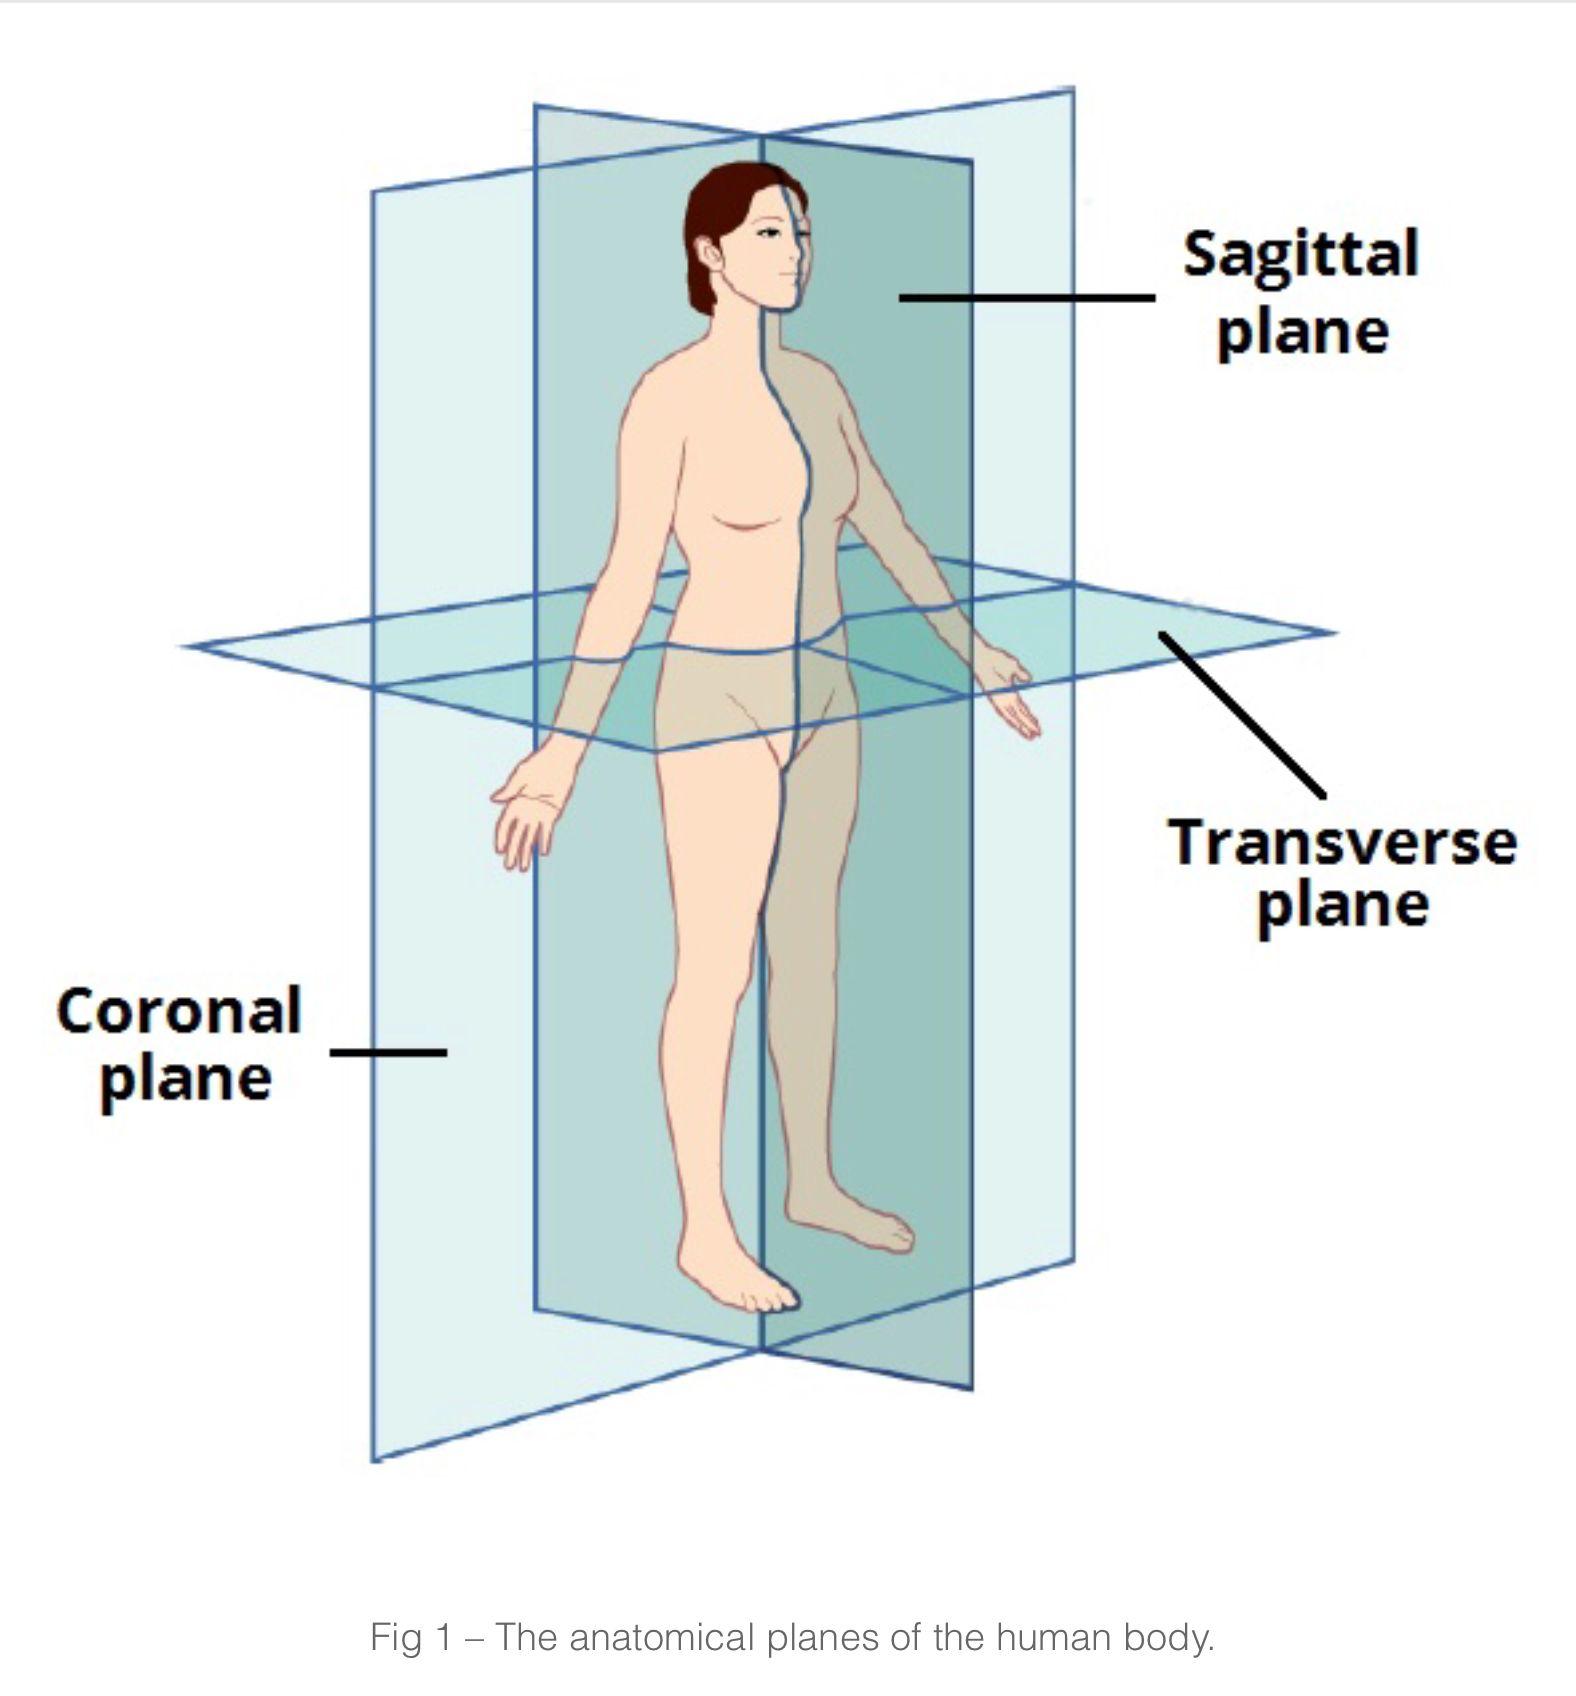 Human Anatomy Planes Images Human Anatomy Organs Diagram